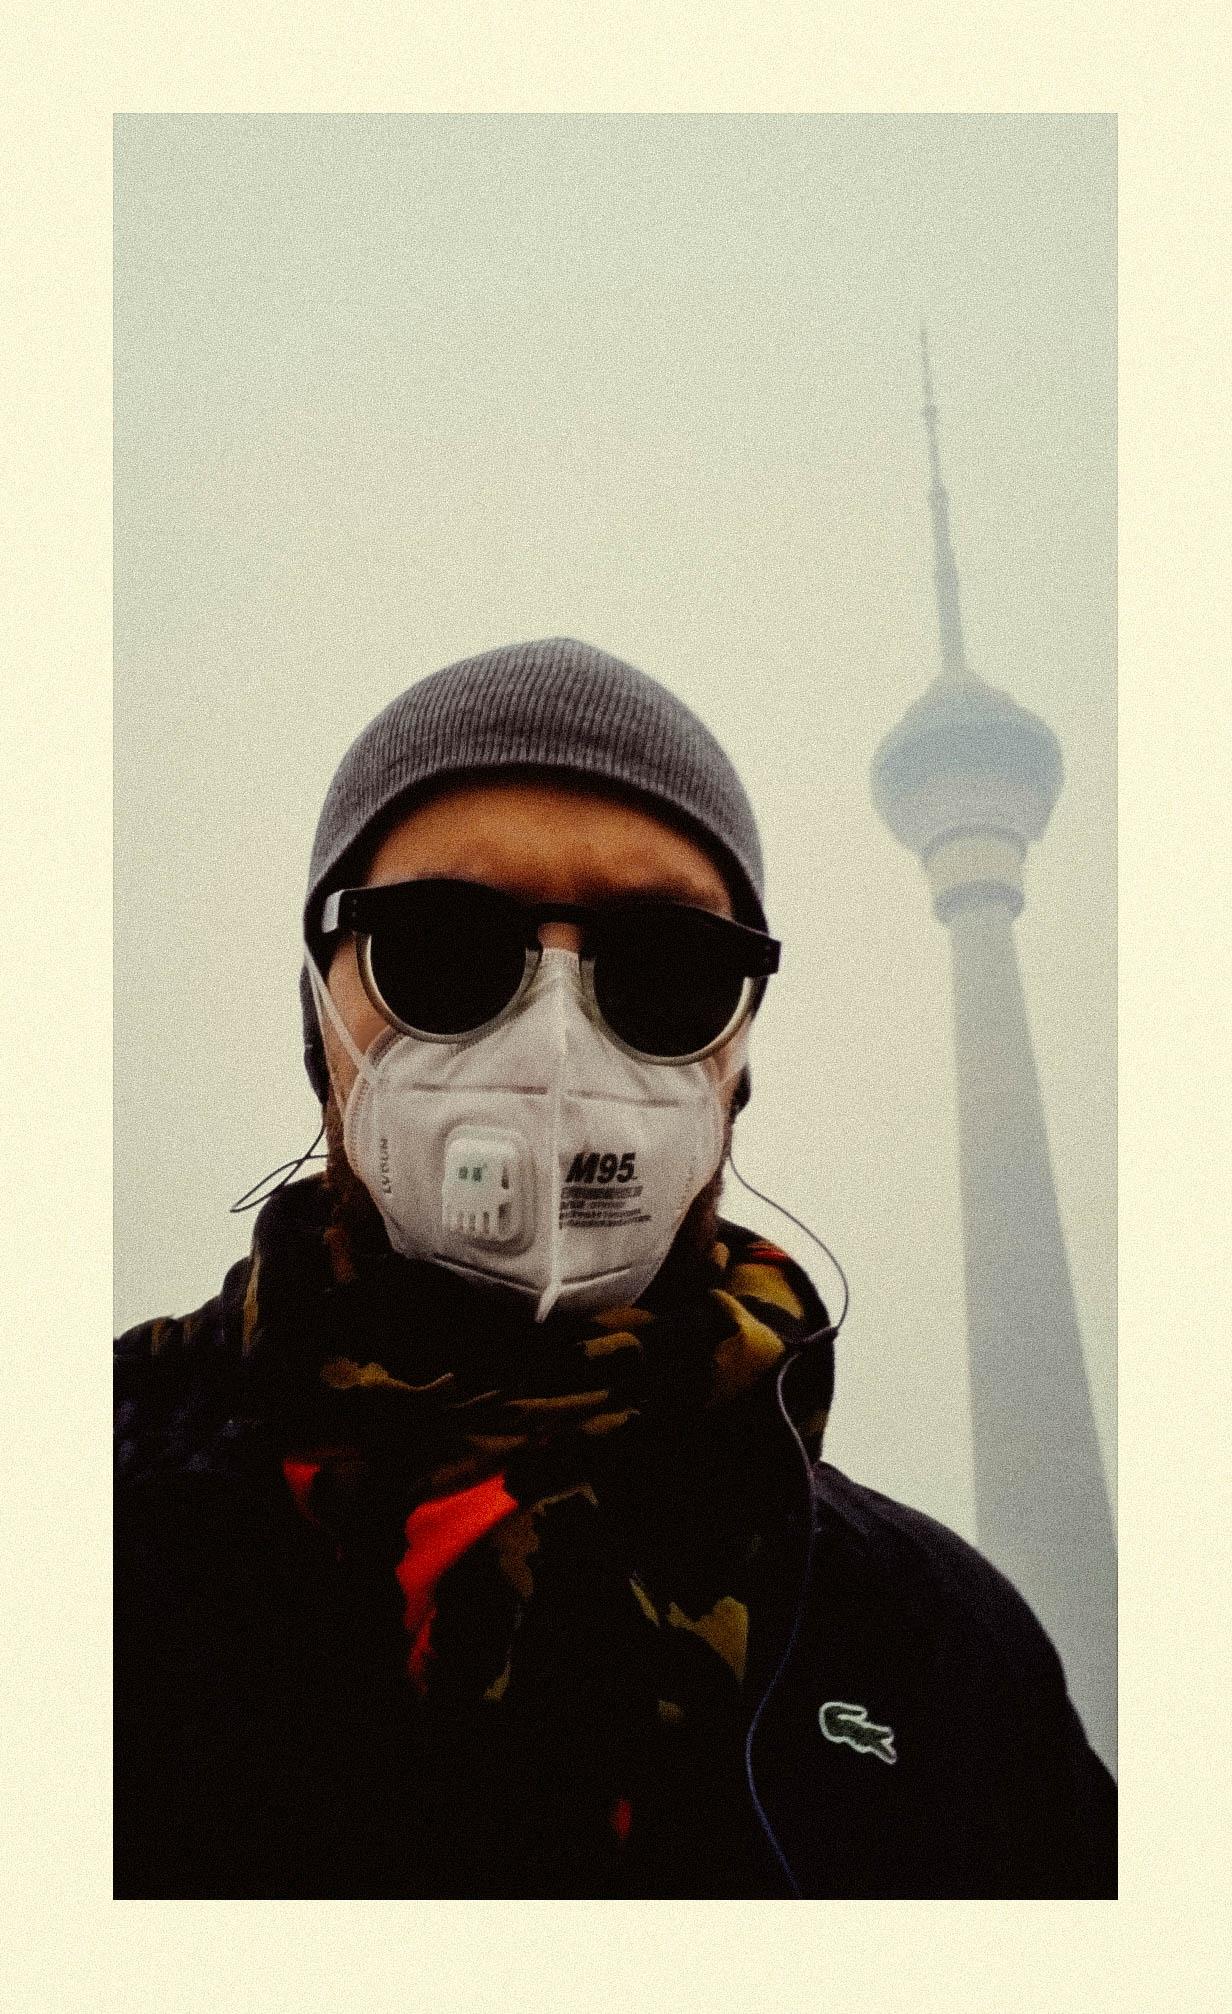 2016 - III - Pekin - CCTV tower - smog - xperia-211.jpg